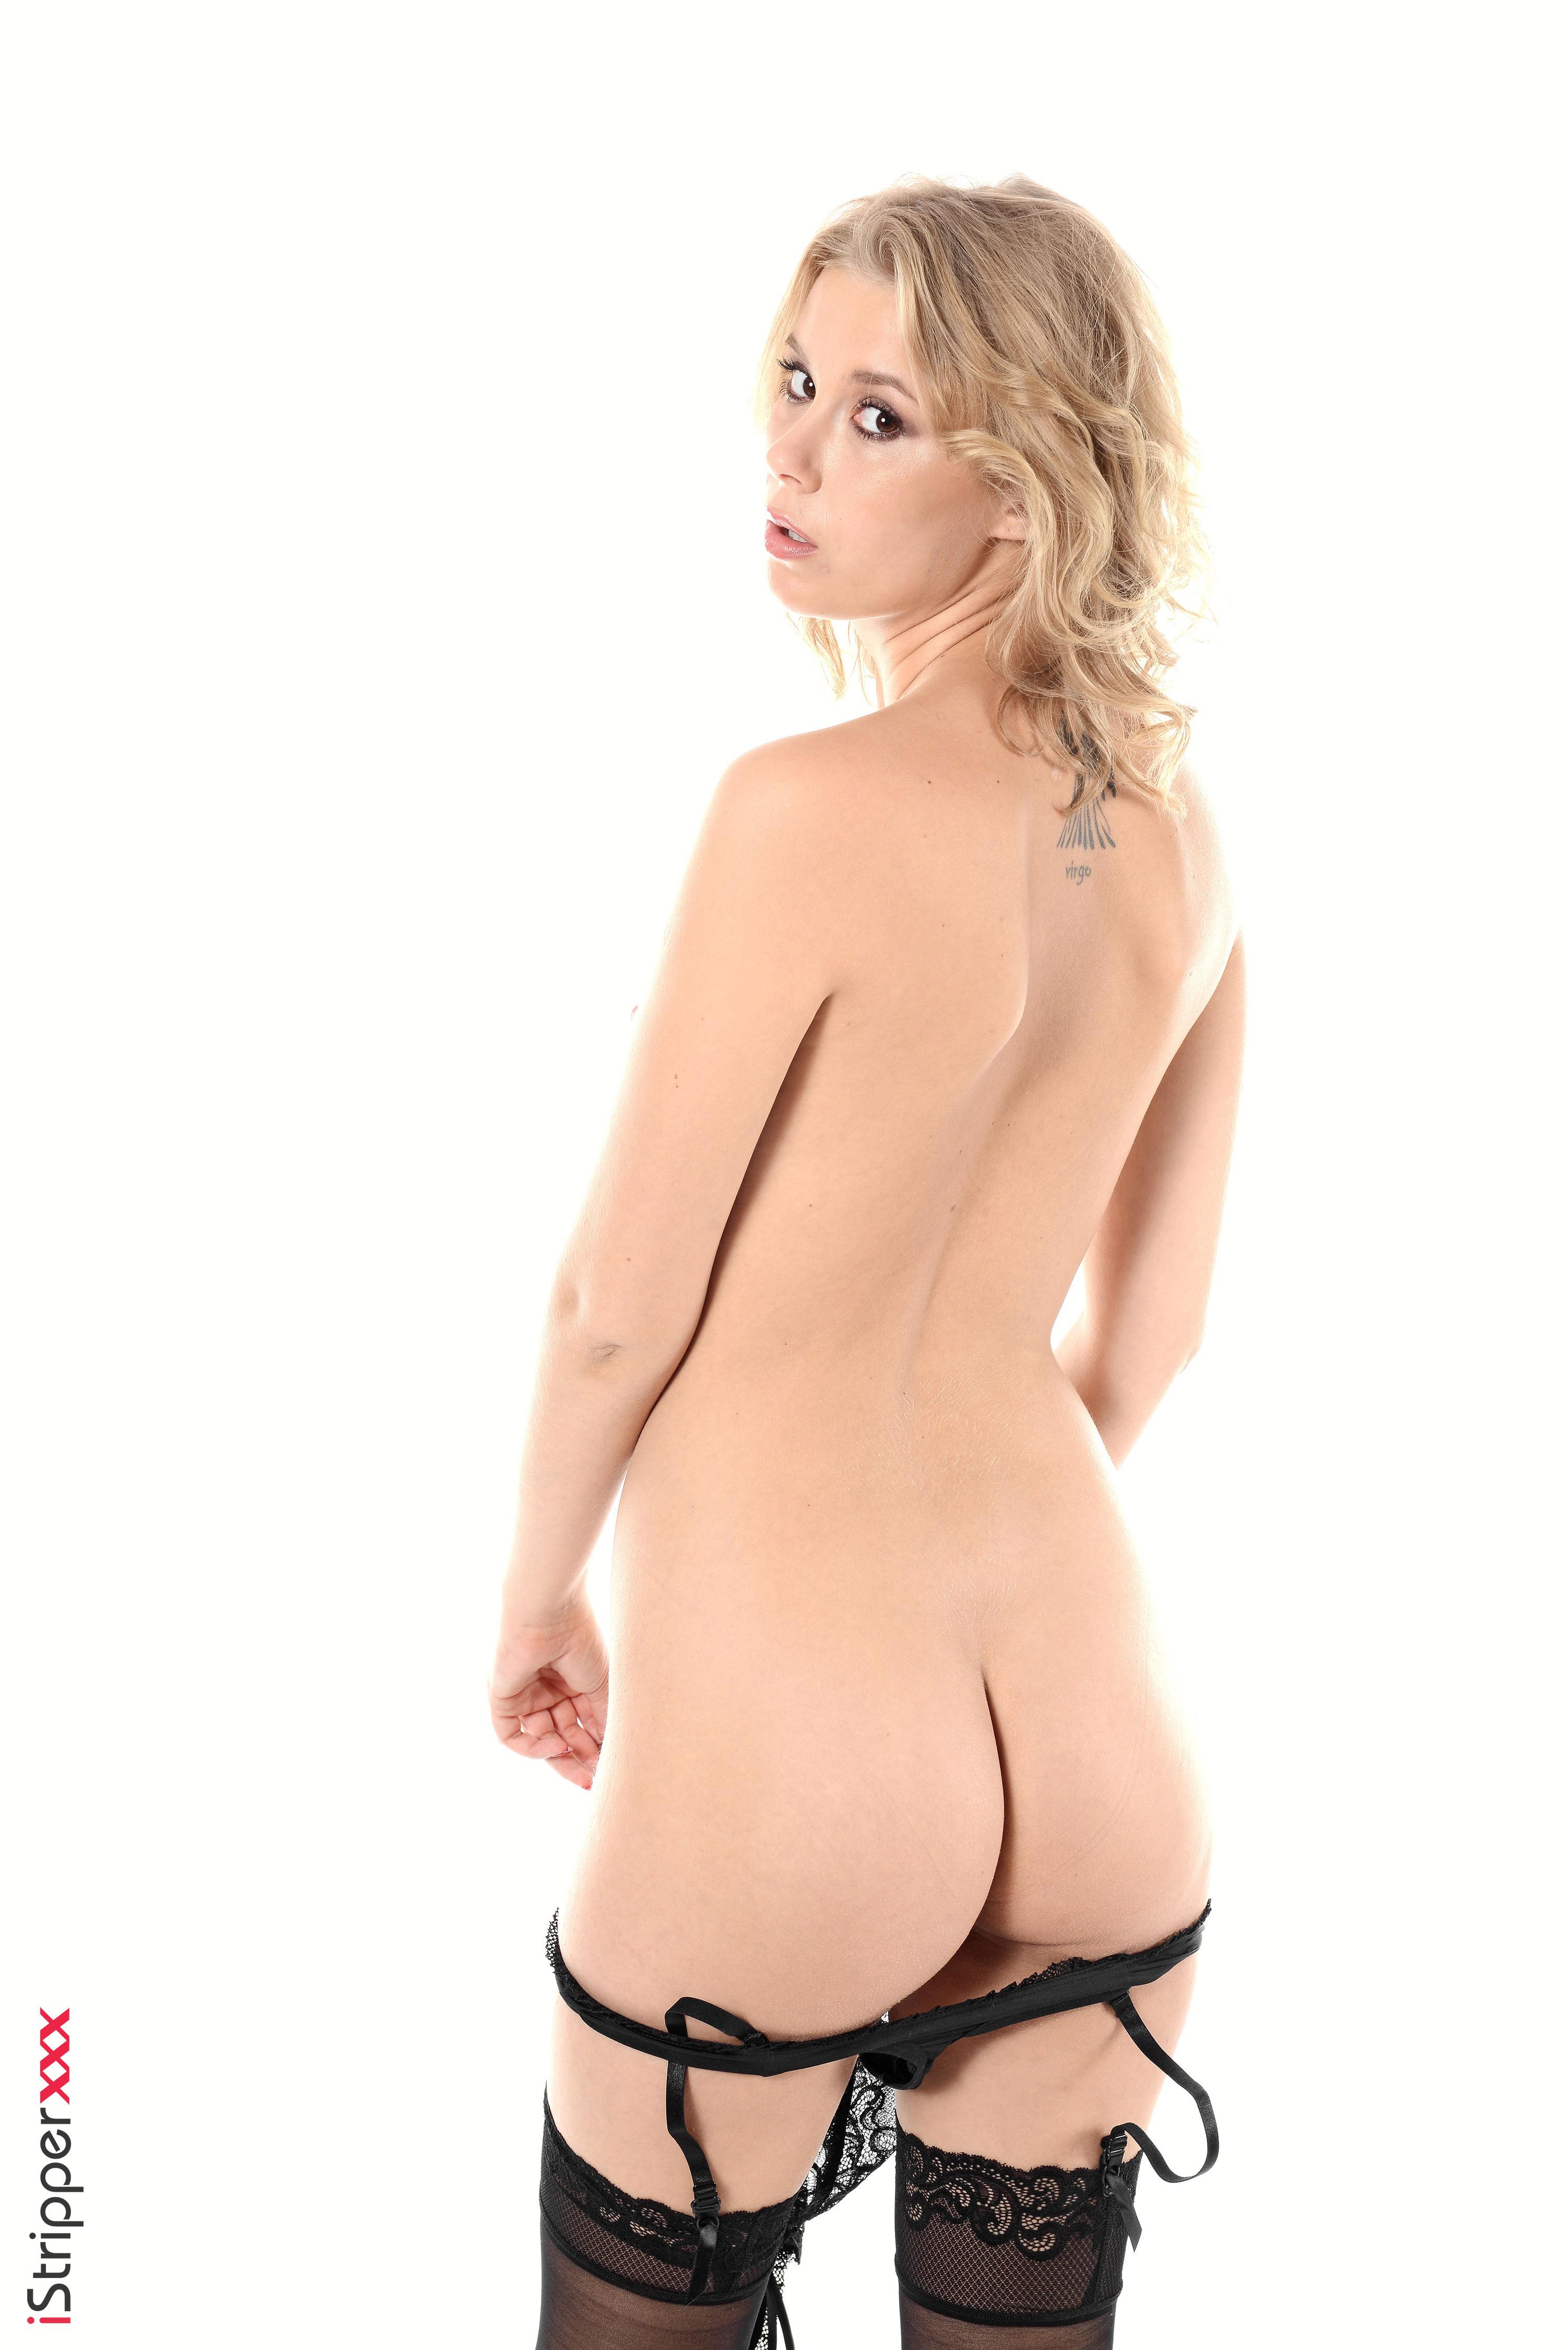 tila tequila nude wallpapers